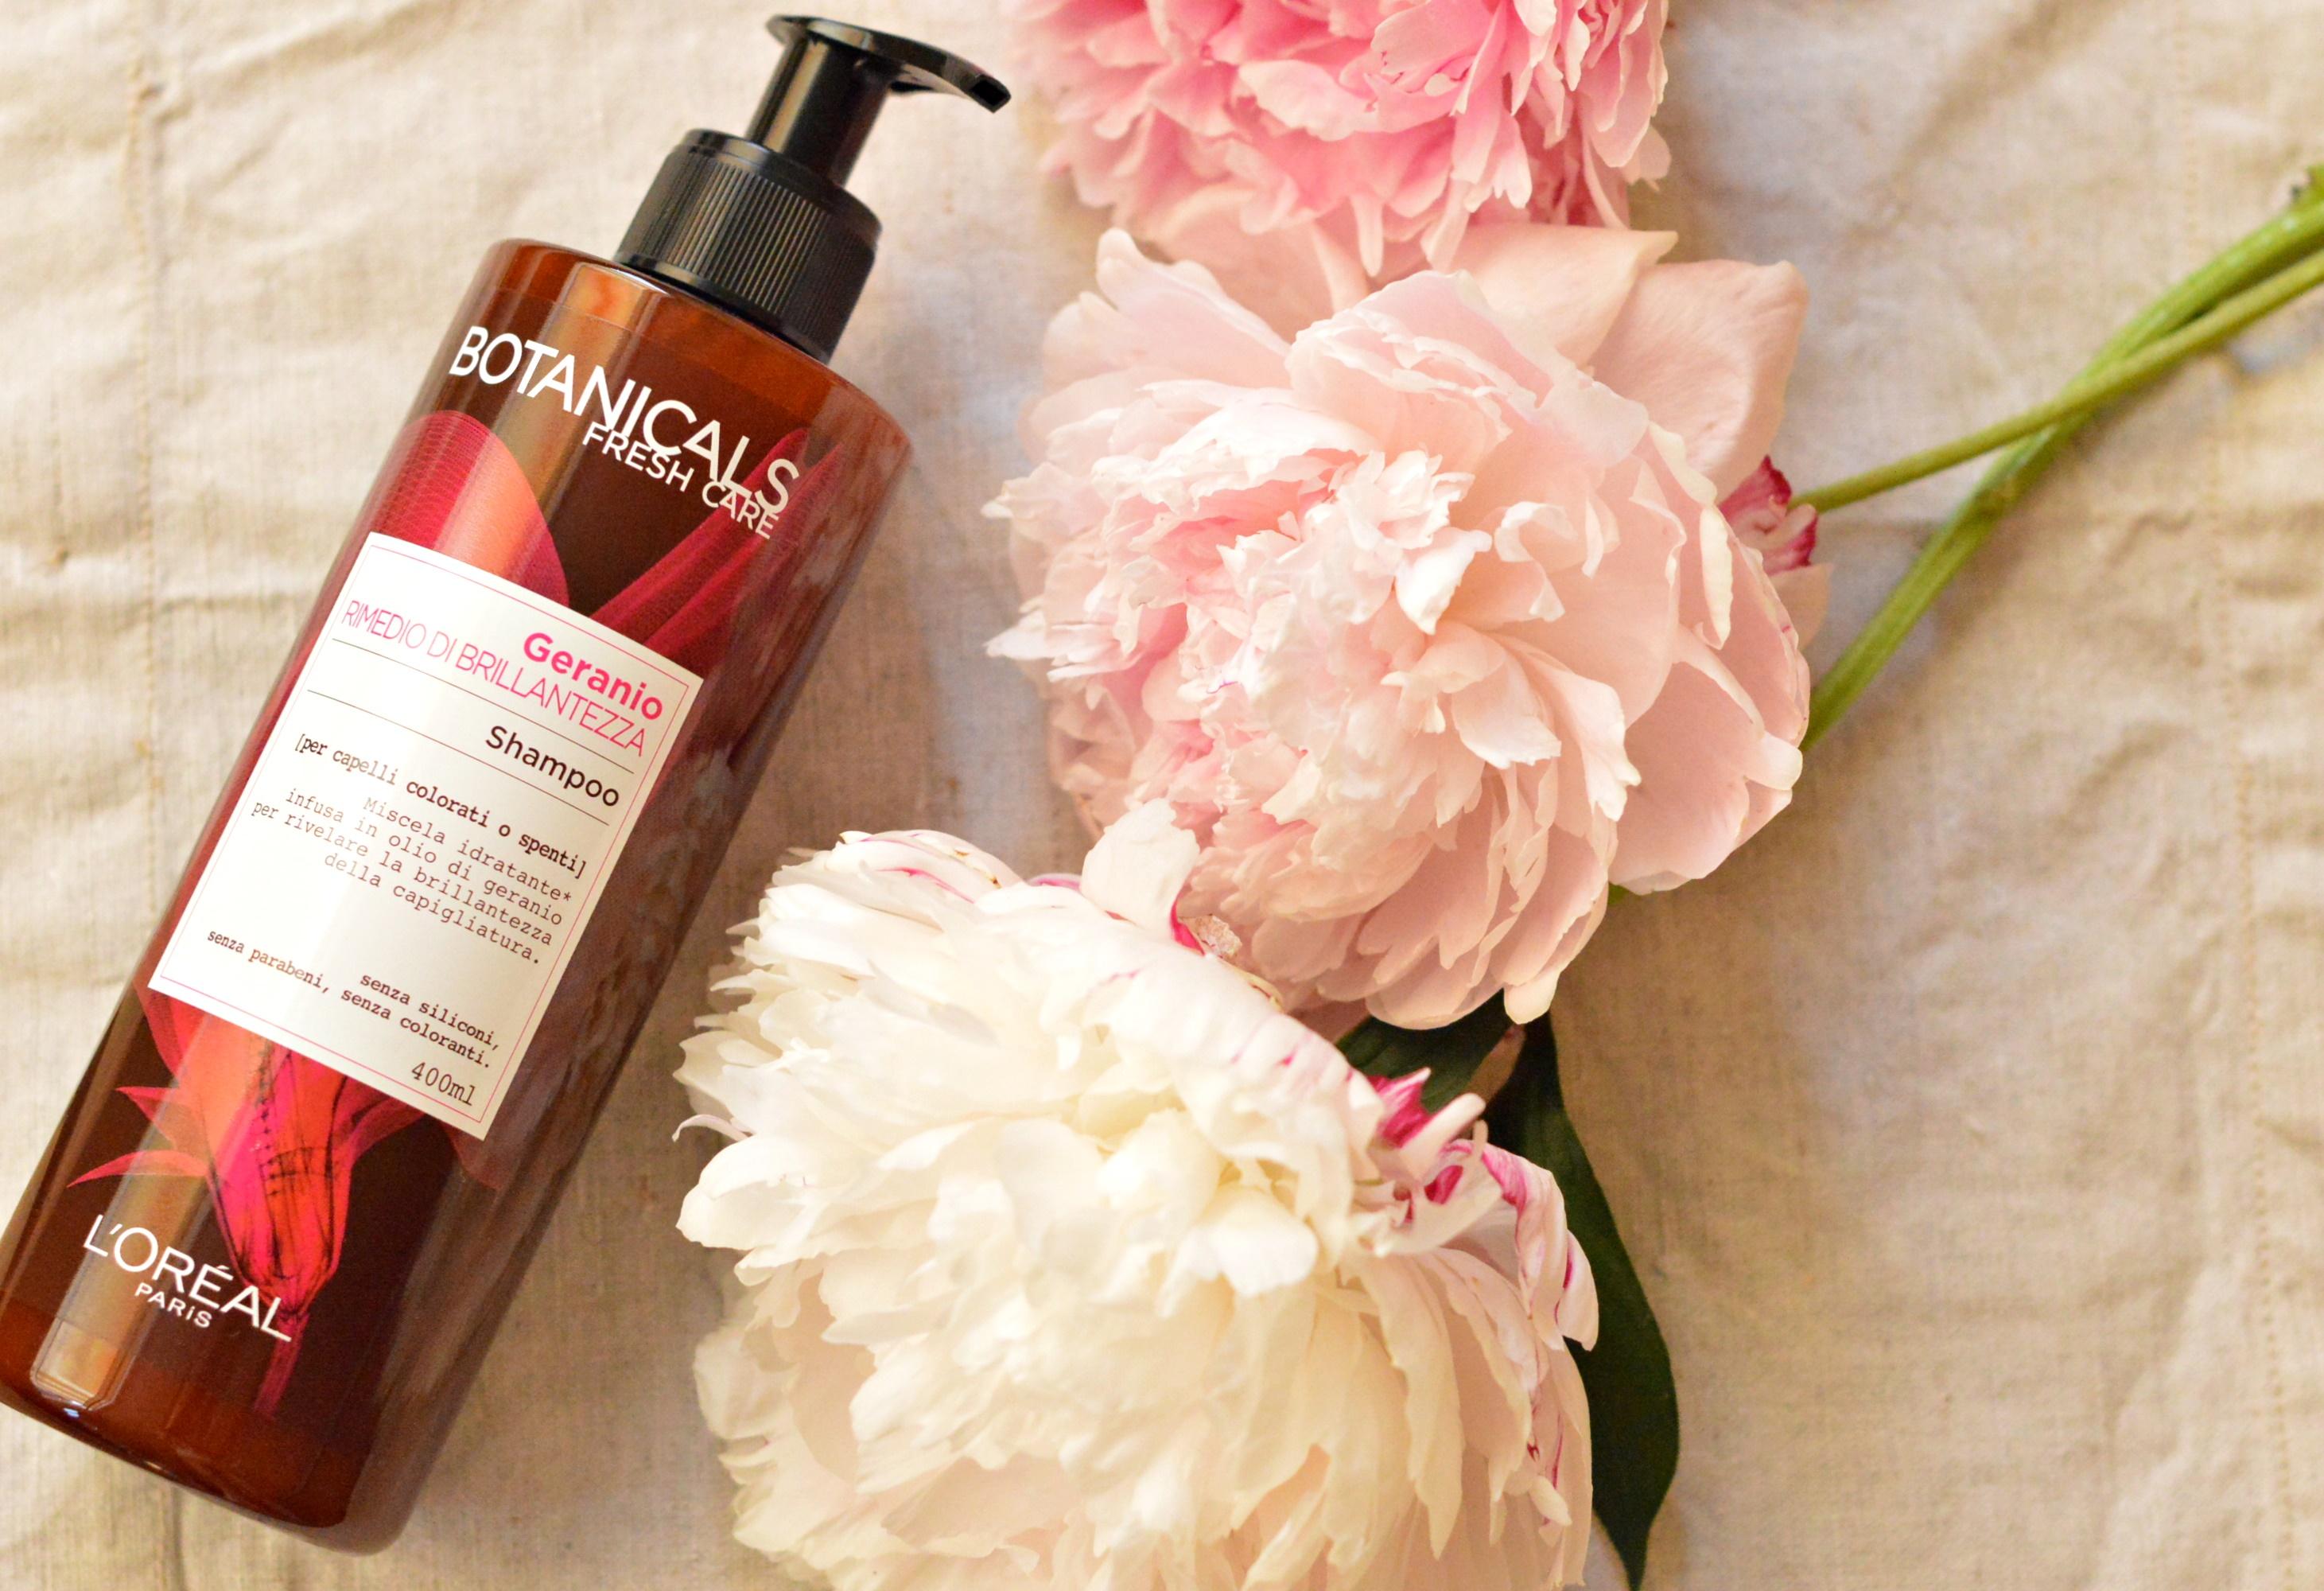 L Oréal Botanicals fresh care  Geranium radiance remedy. ca5bc308c00f